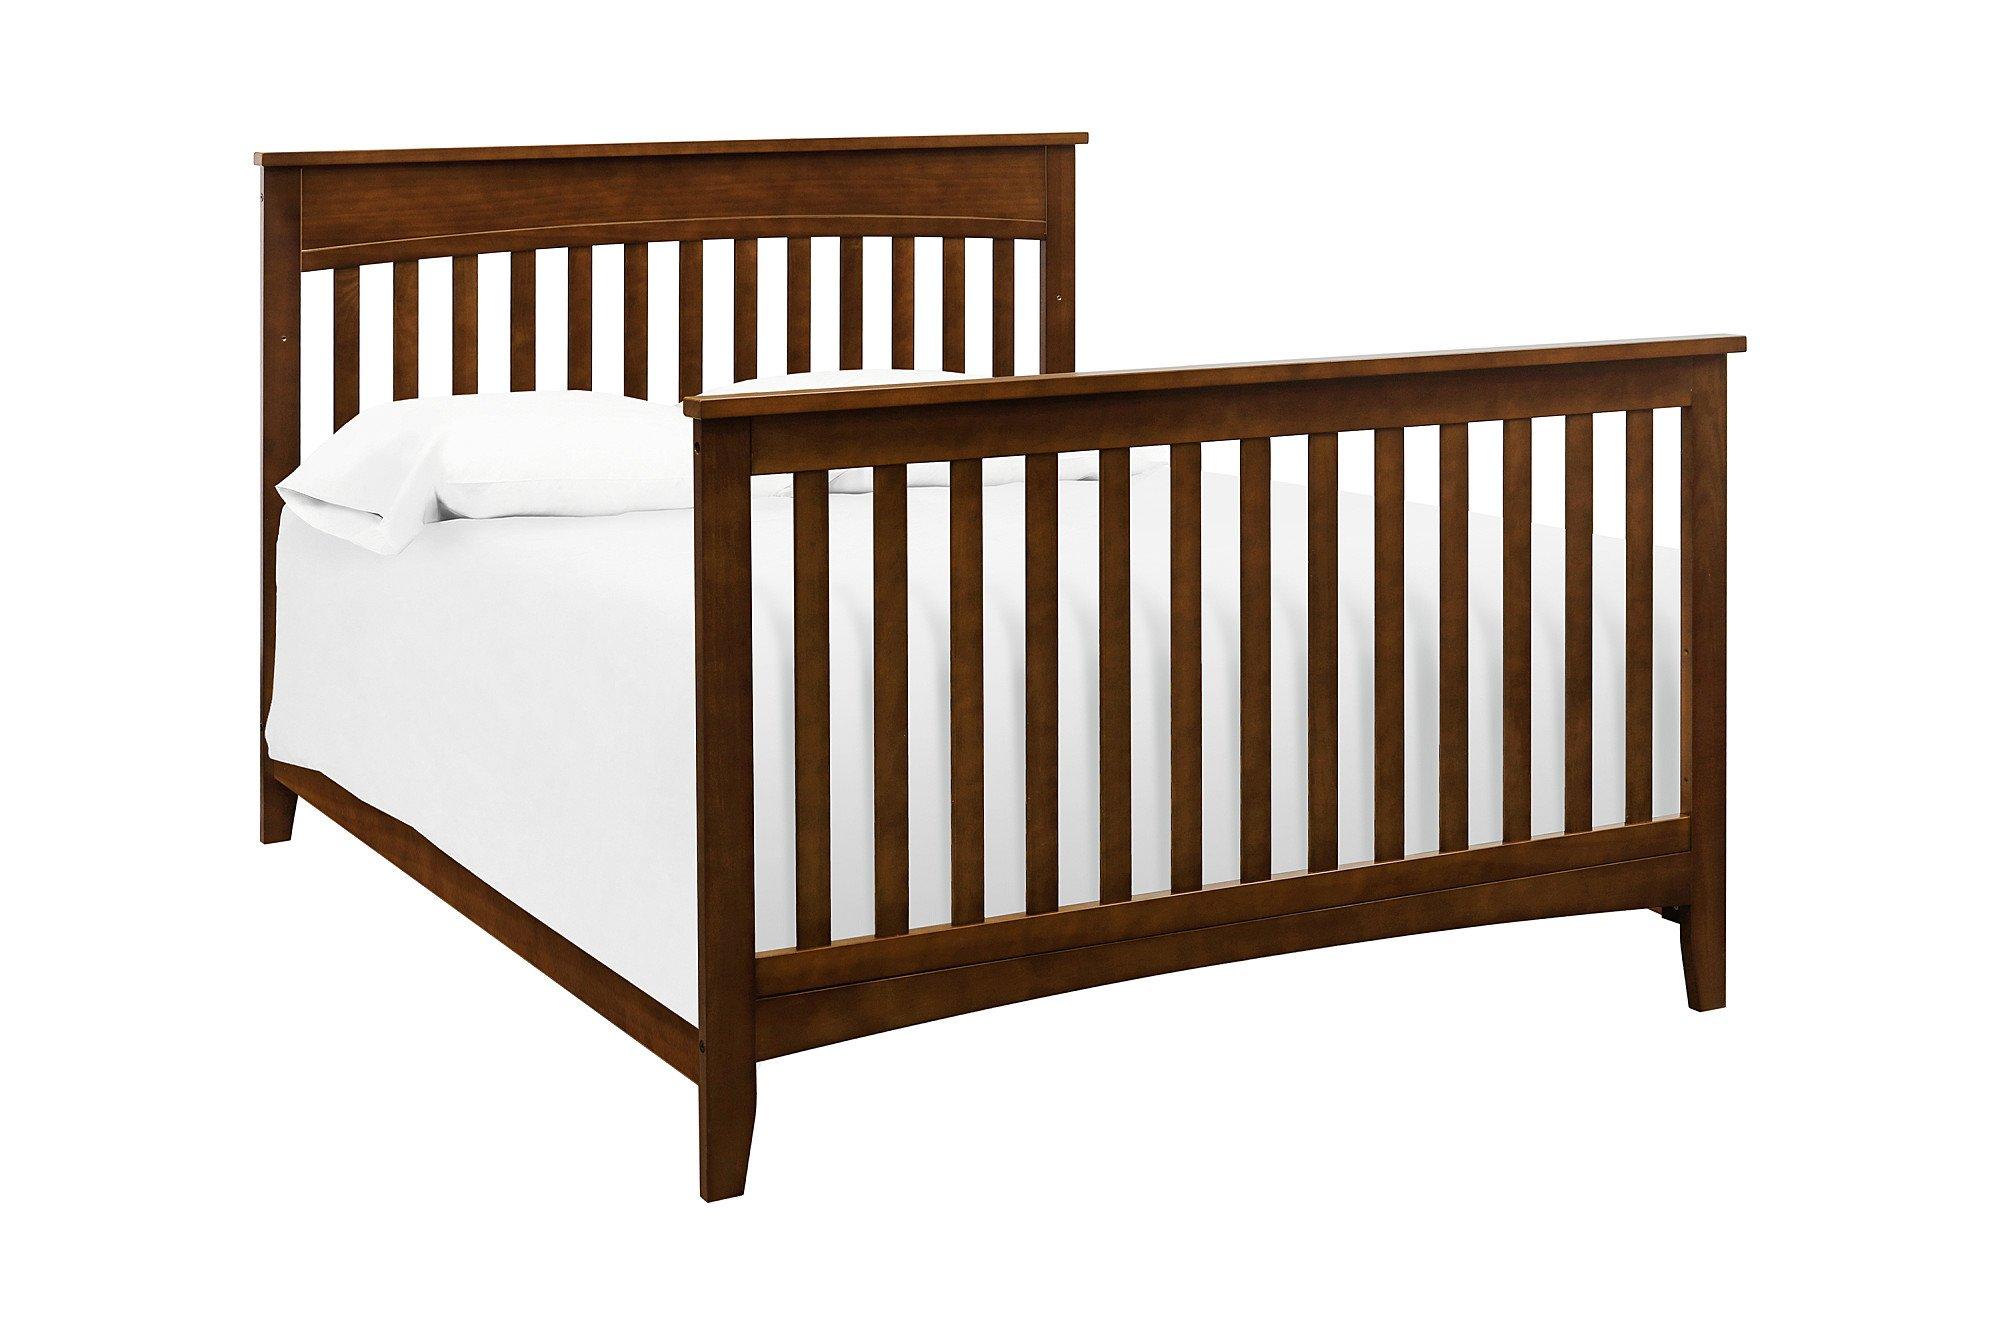 Full Size Conversion Kit Bed Rails for Davinci Grove 4-in-1 Crib - Espresso by CC KITS